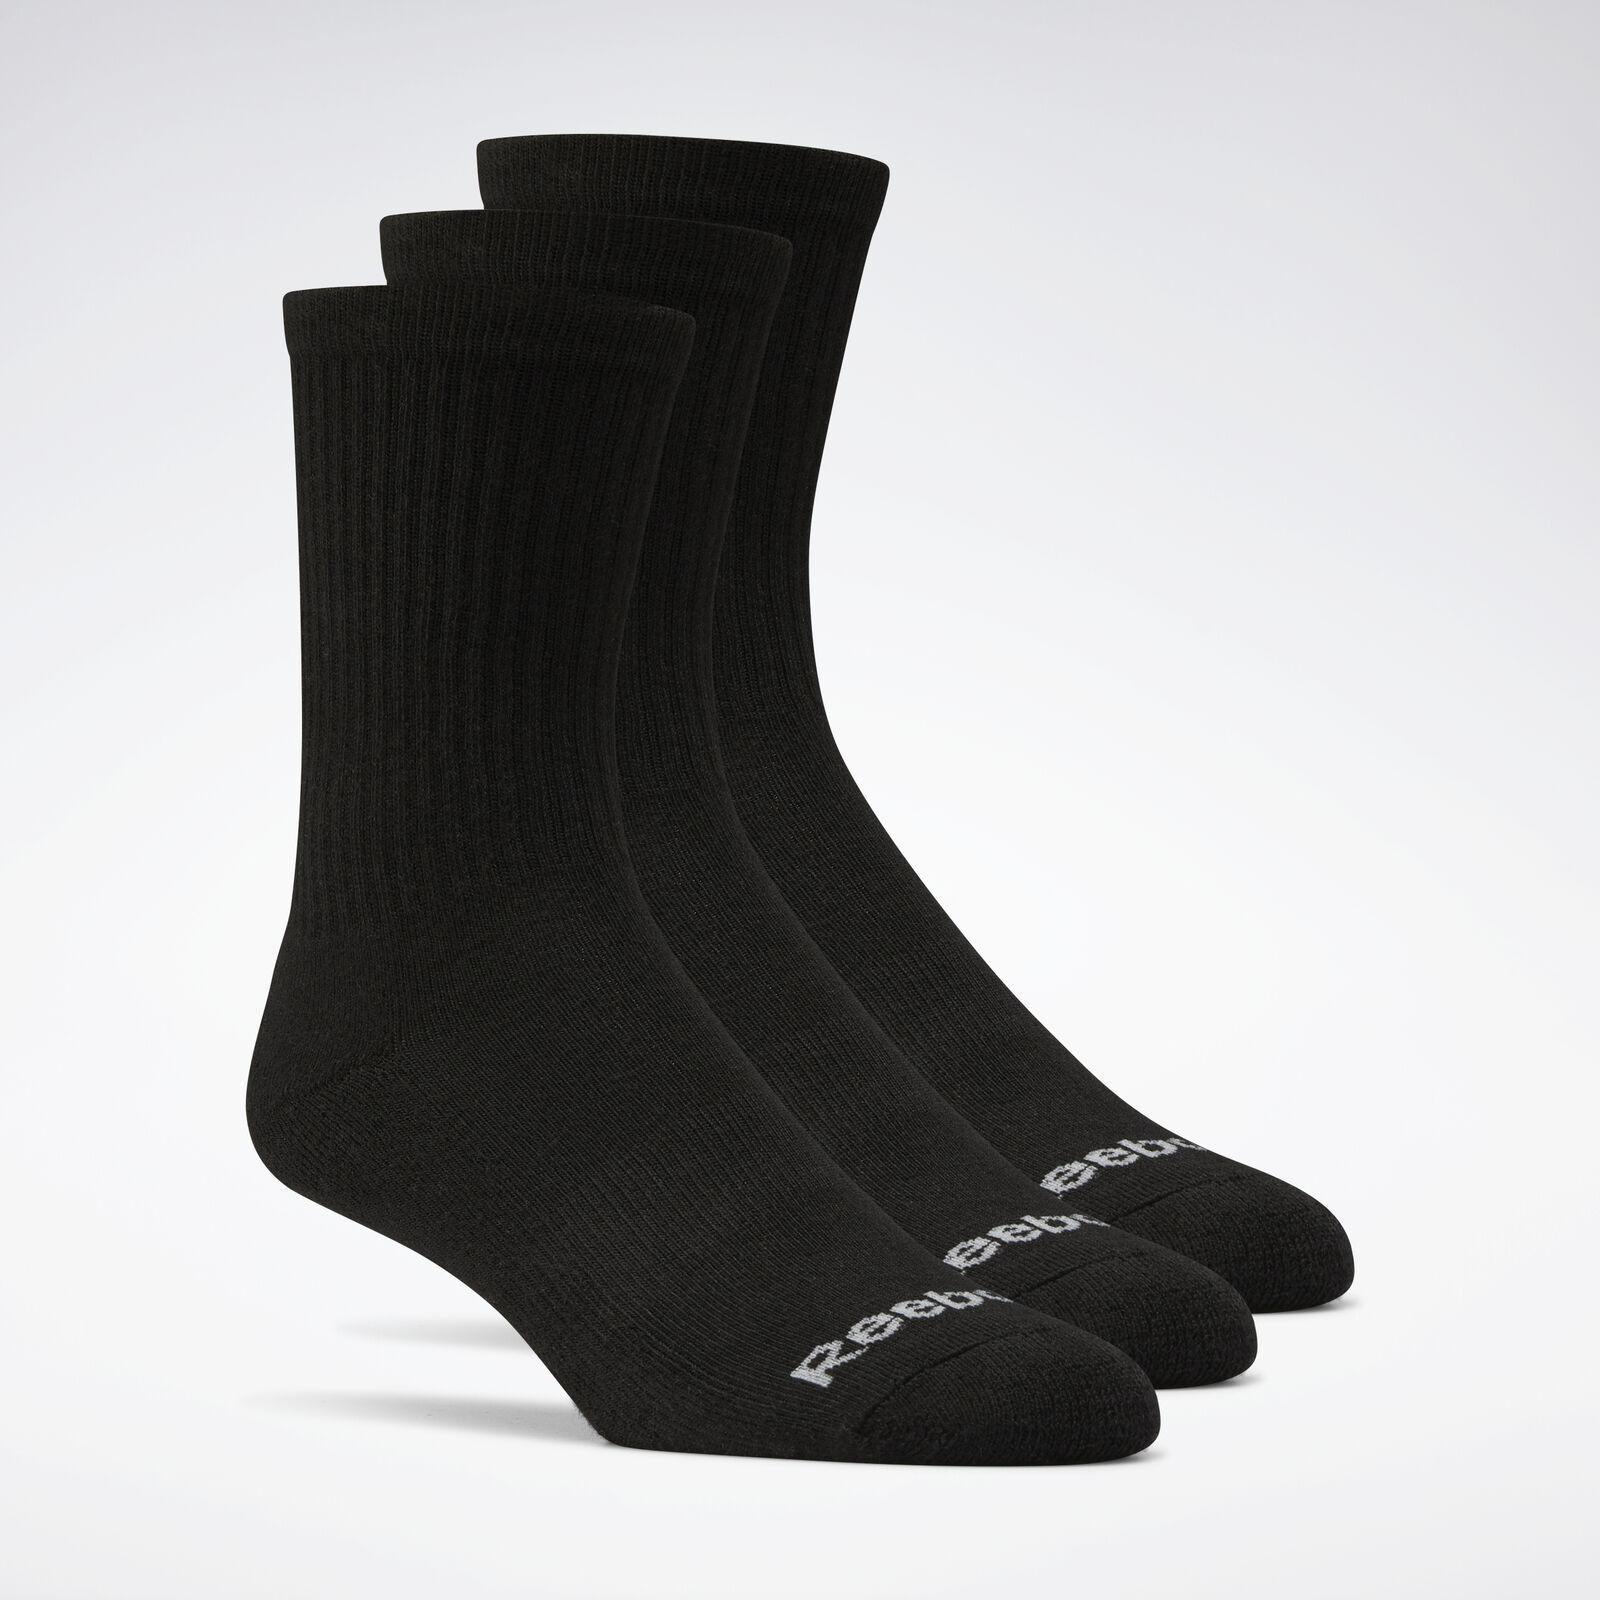 3 Pack Reebok Women/'s Crew Cut Socks